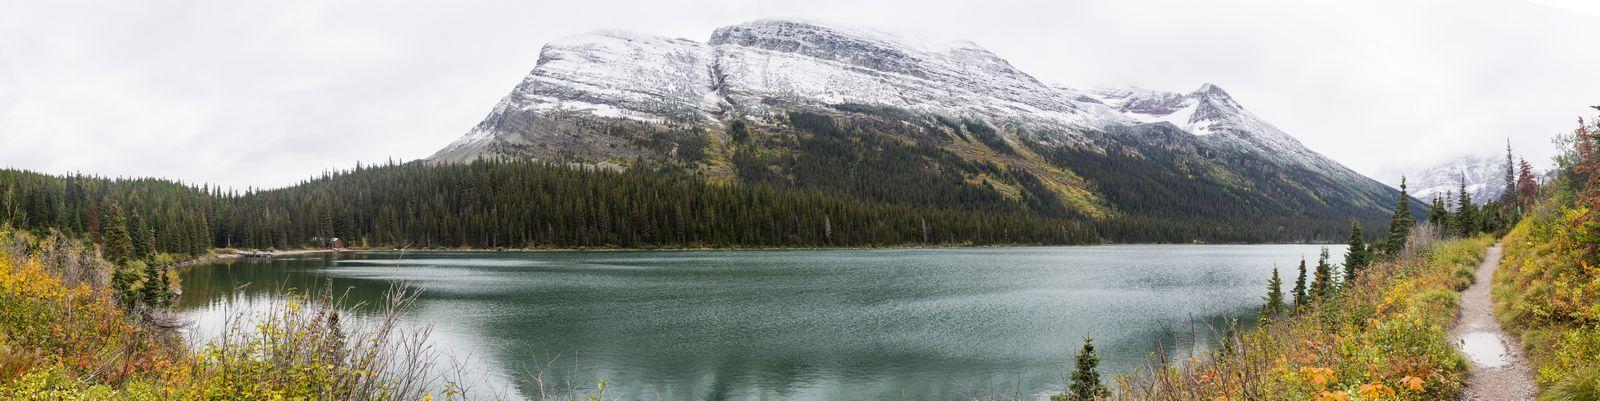 Lake Josephine, de lado a lado